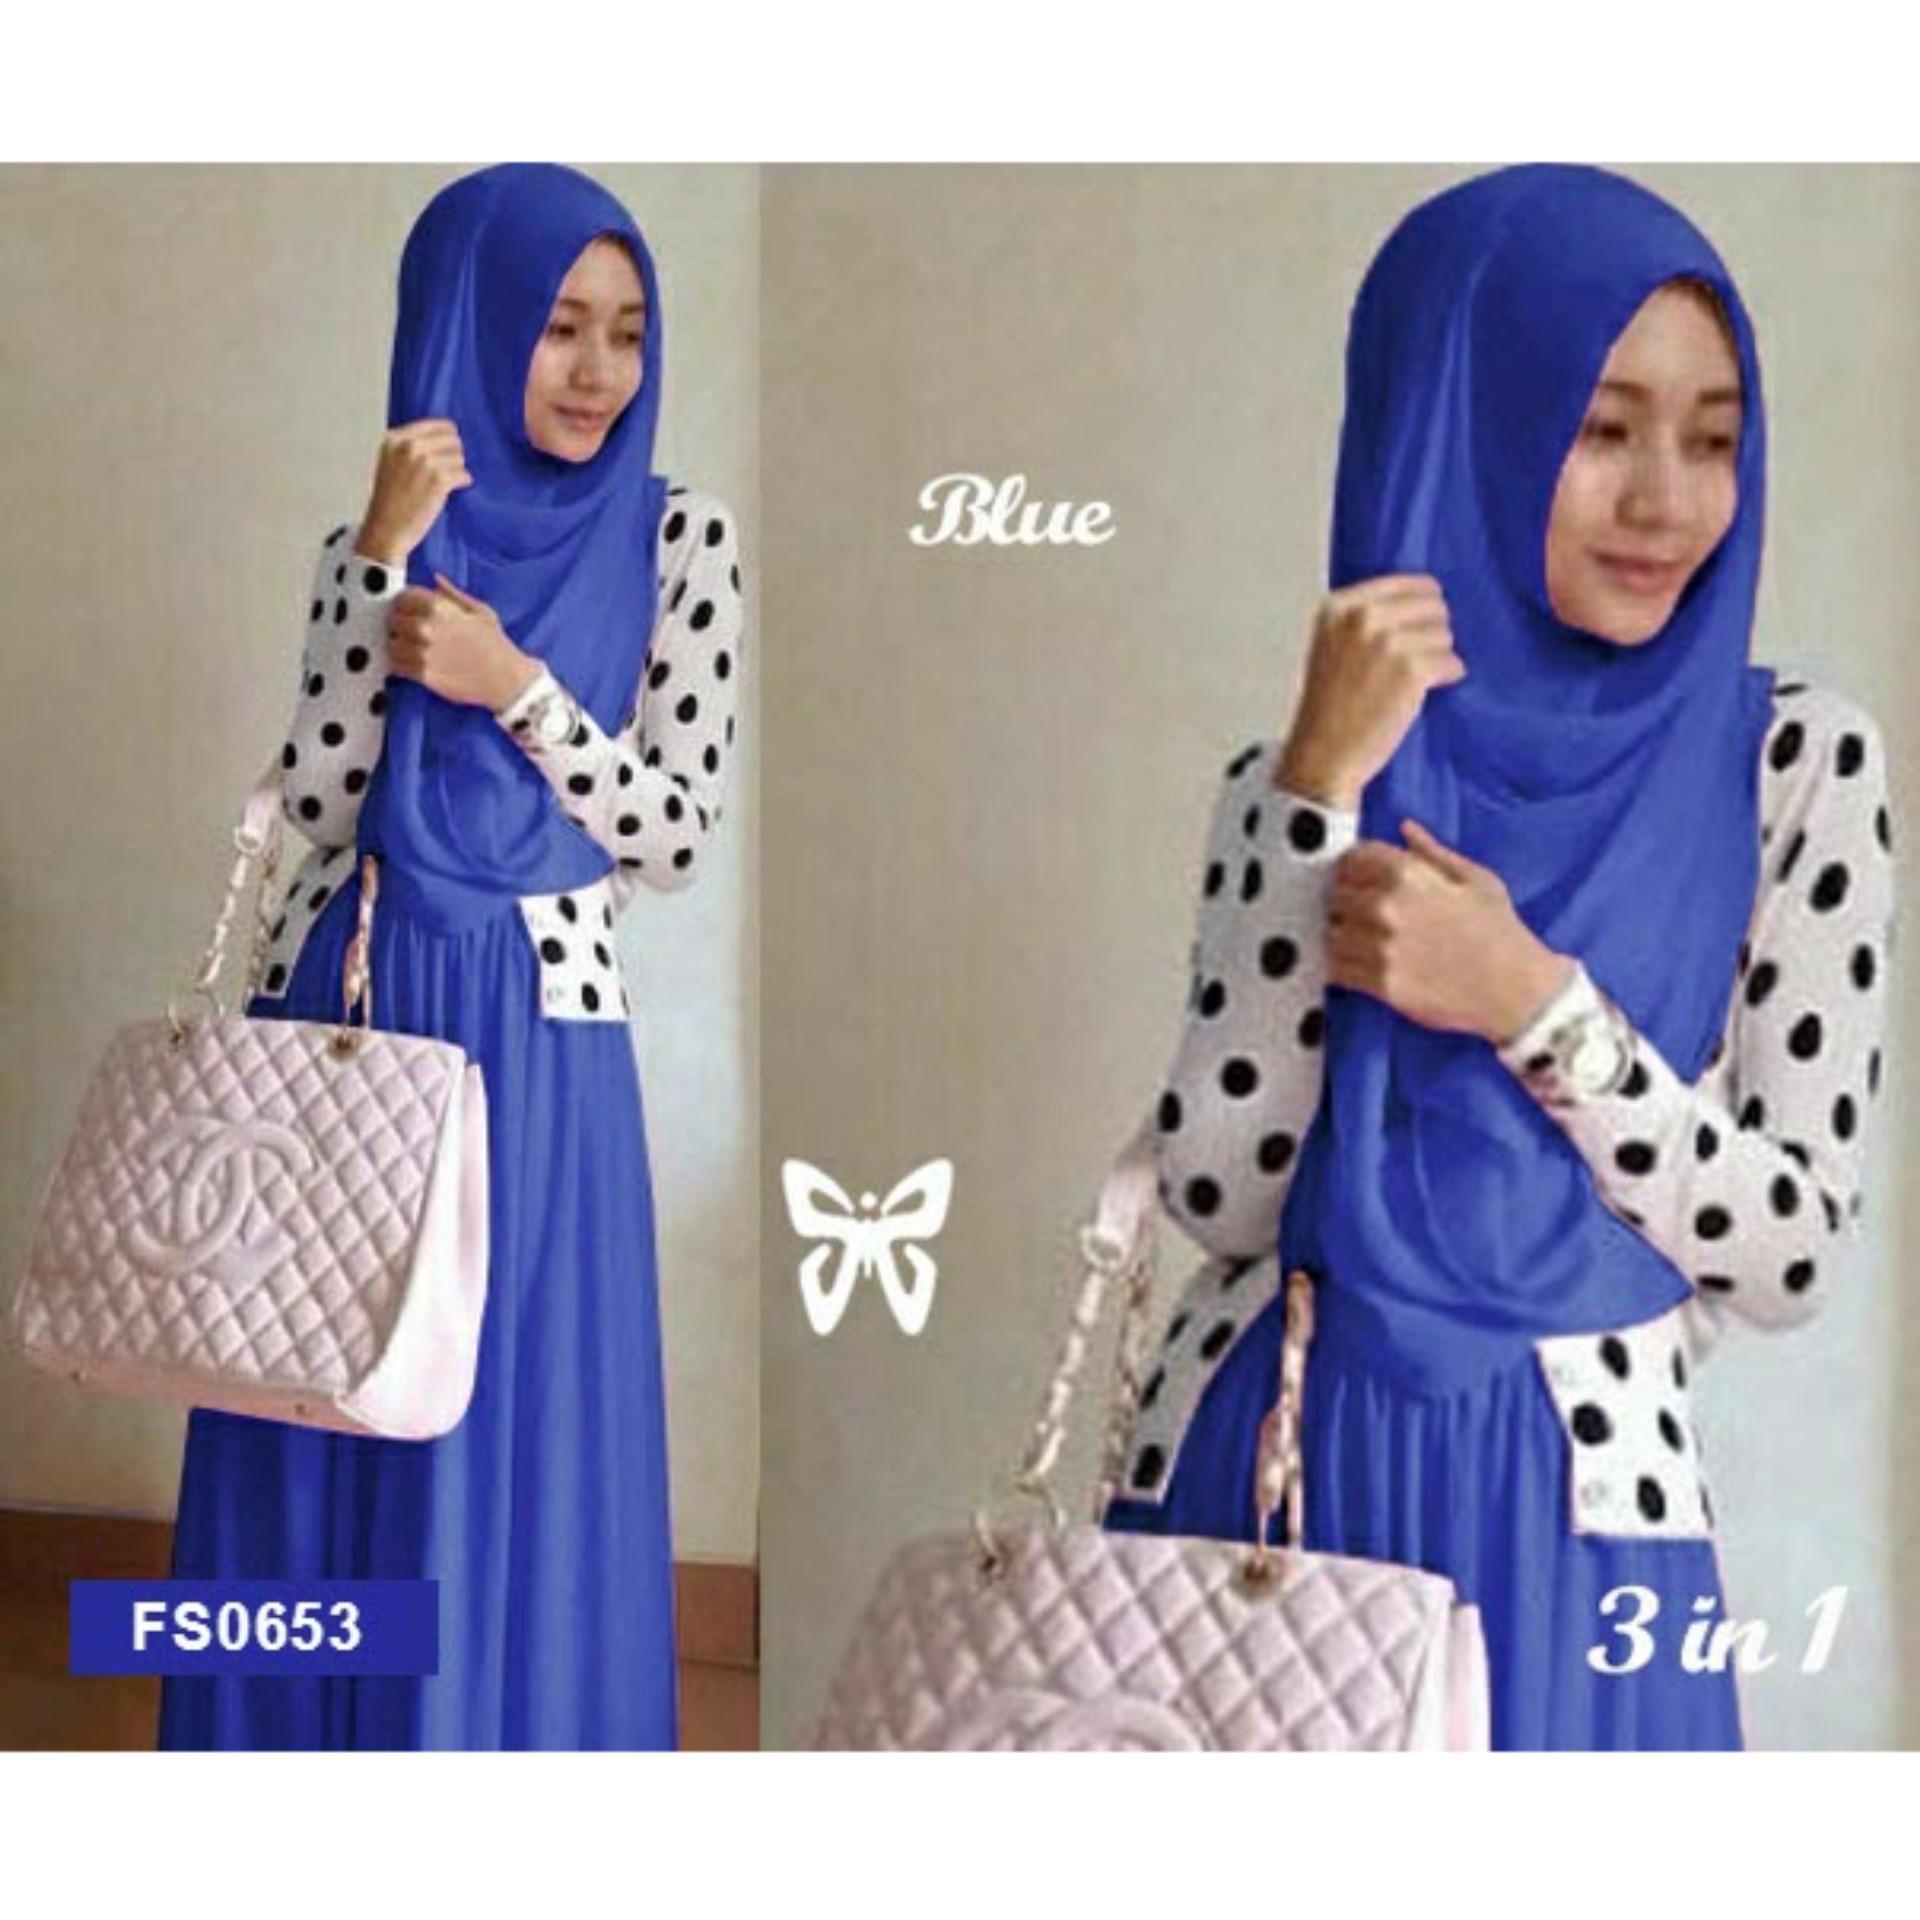 Flash Sale Flavia Store Maxi Dress Set 3 In 1 Fs0653 Biru Gamis  Blazer Denim Pakaian Wanita Navy L Gaun Panjang Muslimah Baju Muslim Hijab Srshireen